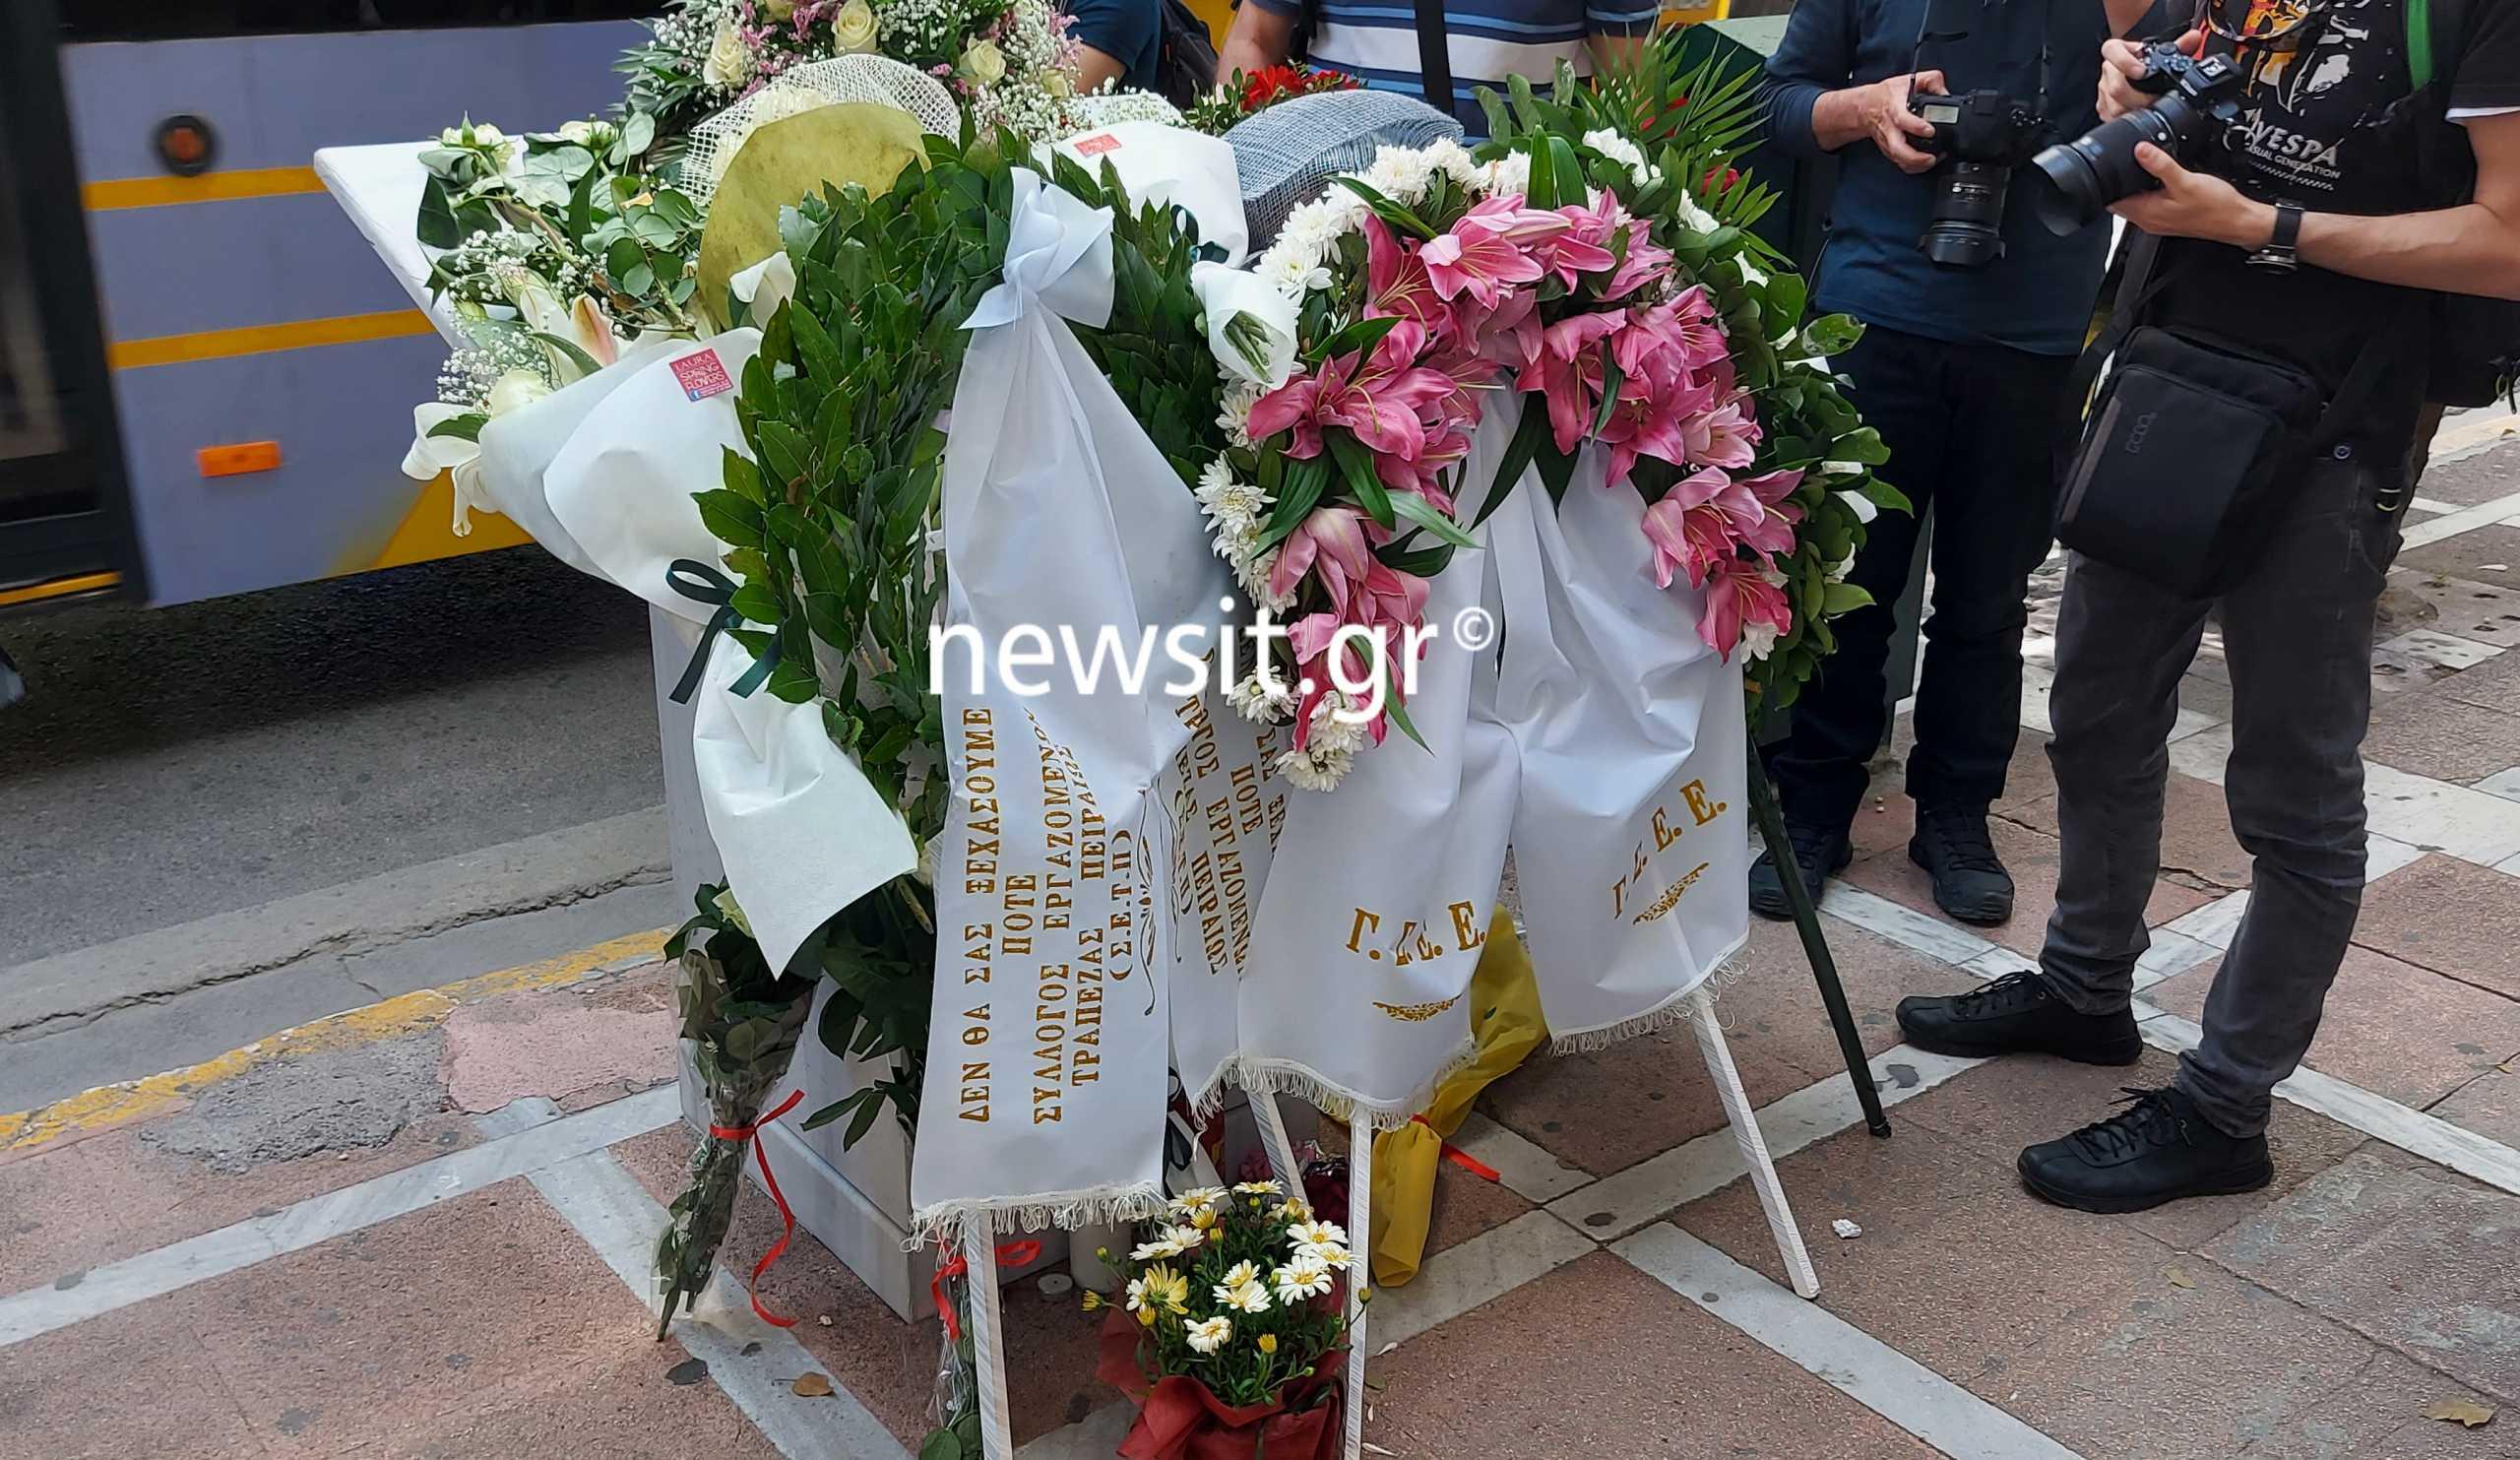 Marfin: Η Μαρία Καραγιάννη επέστρεψε στον τόπο της τραγωδίας (pics, video)